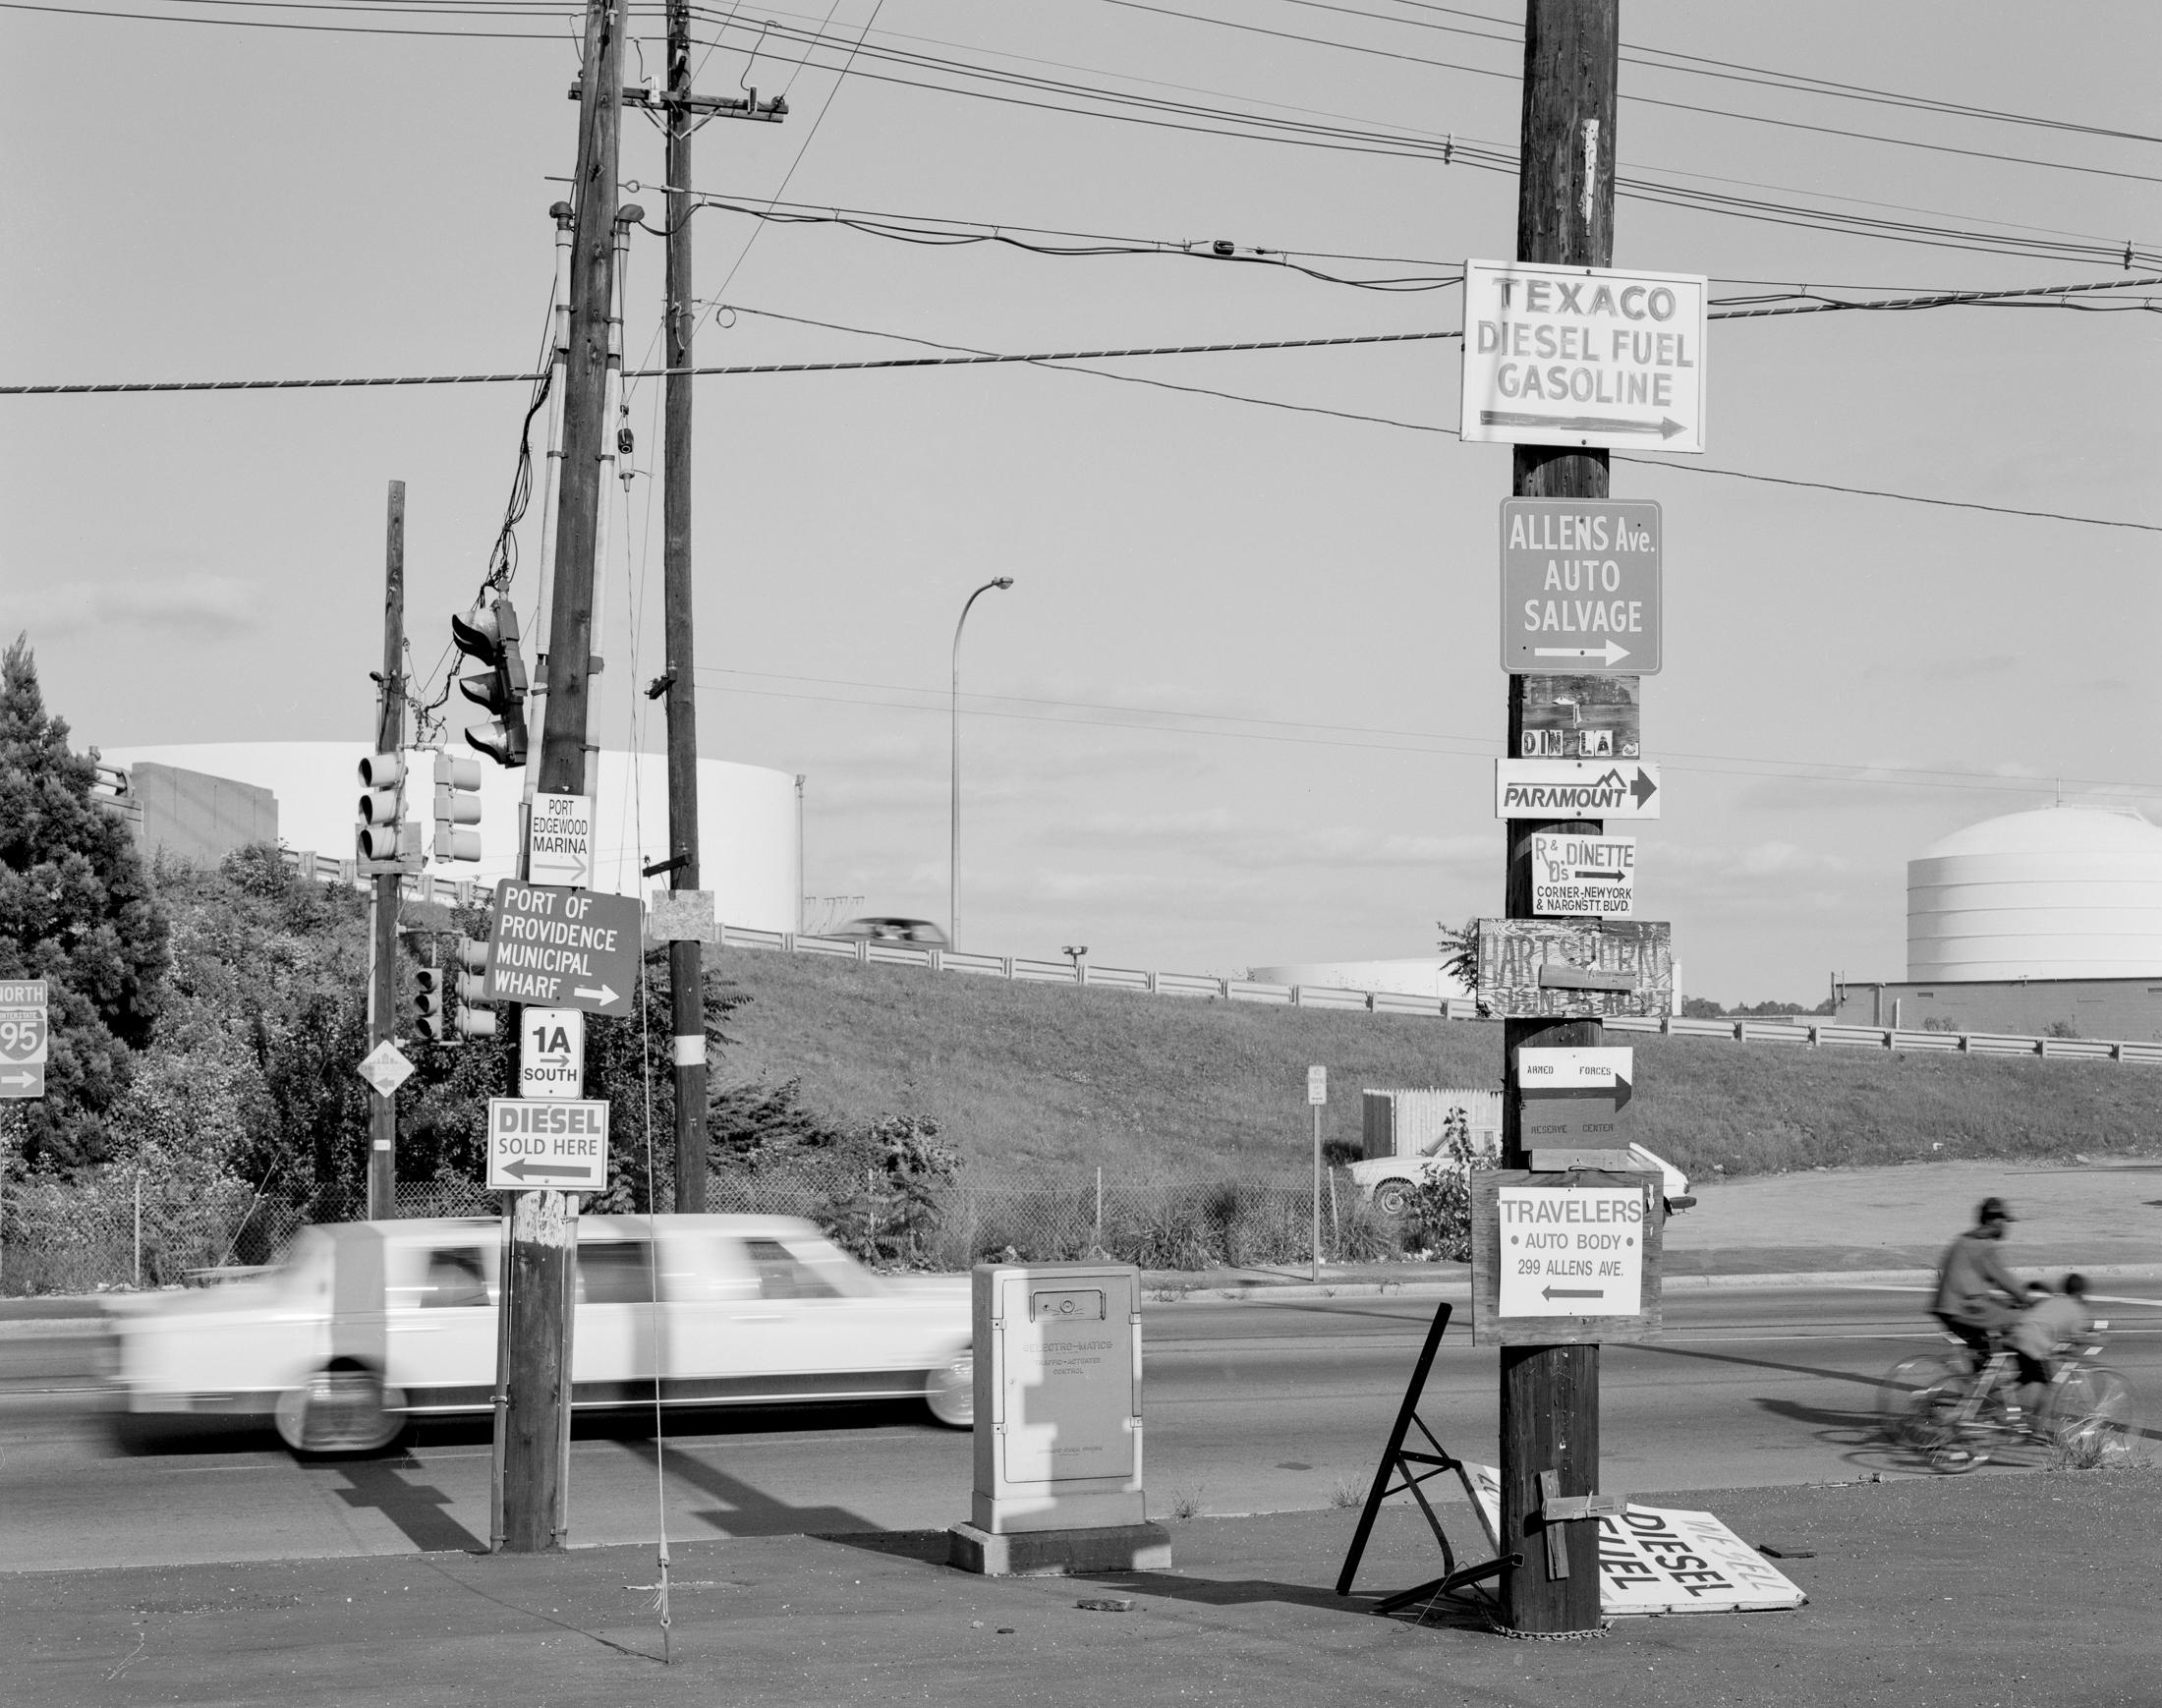 Allens Ave, 1992 #2 4x5 Tri-X